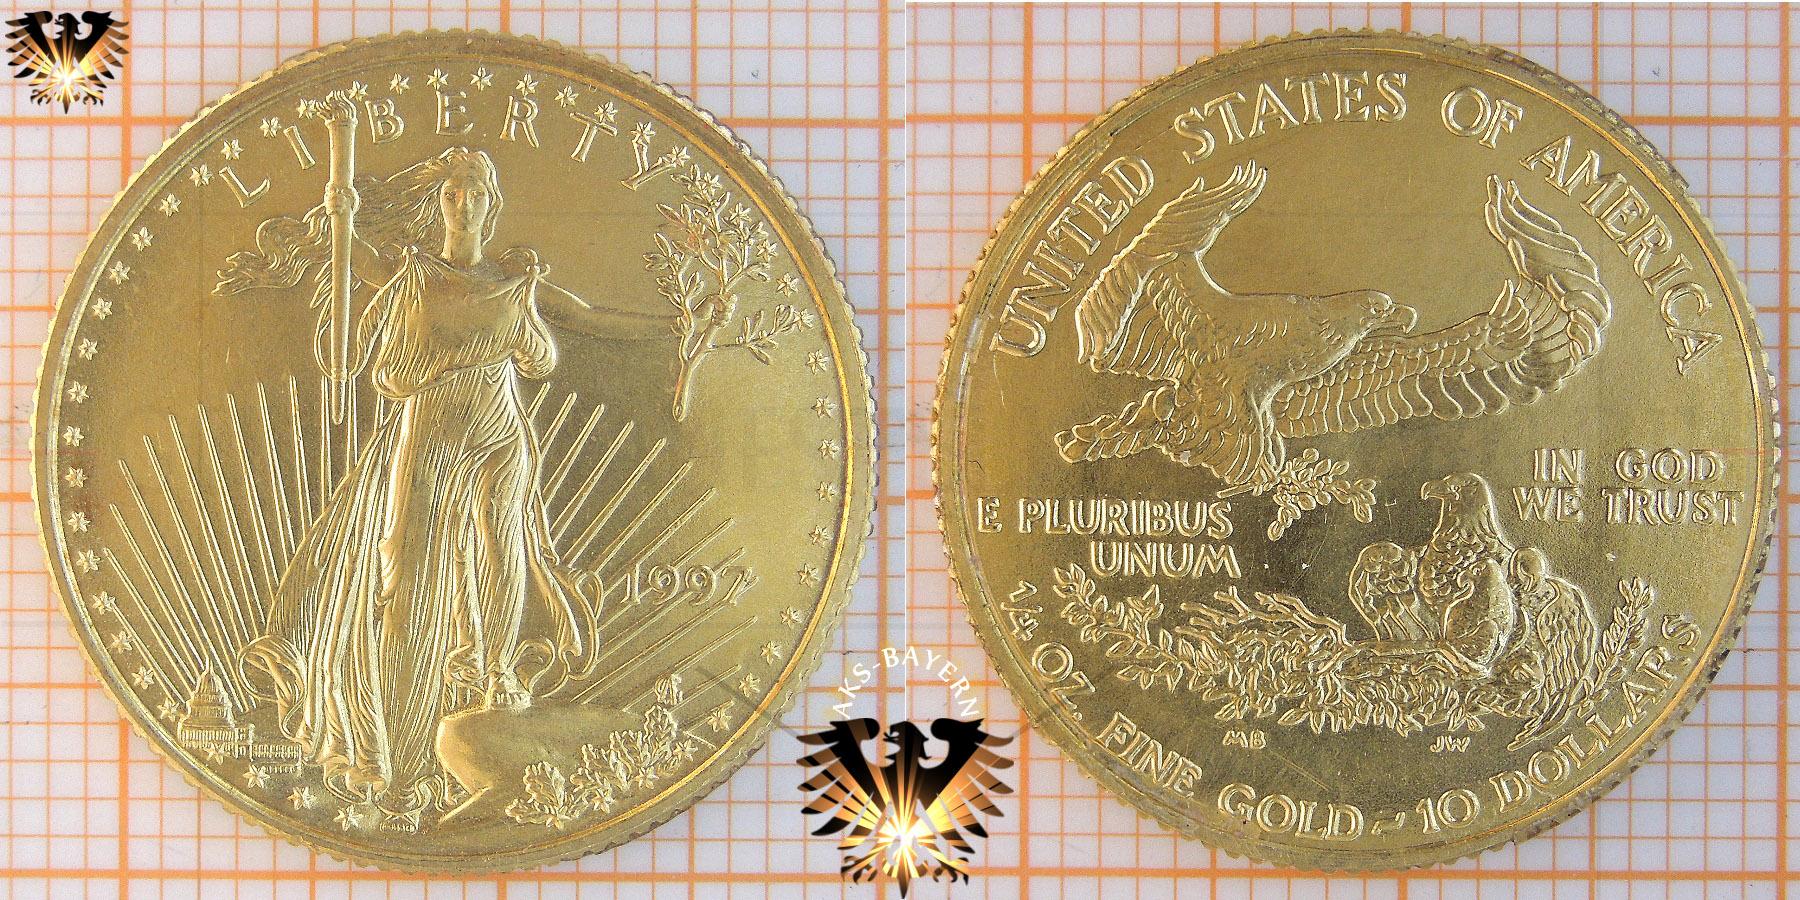 $10 Dollars, Liberty, USA, 1997, American Eagle, 1/4 Unze, Gold © goldankaufstelle-bayern.de